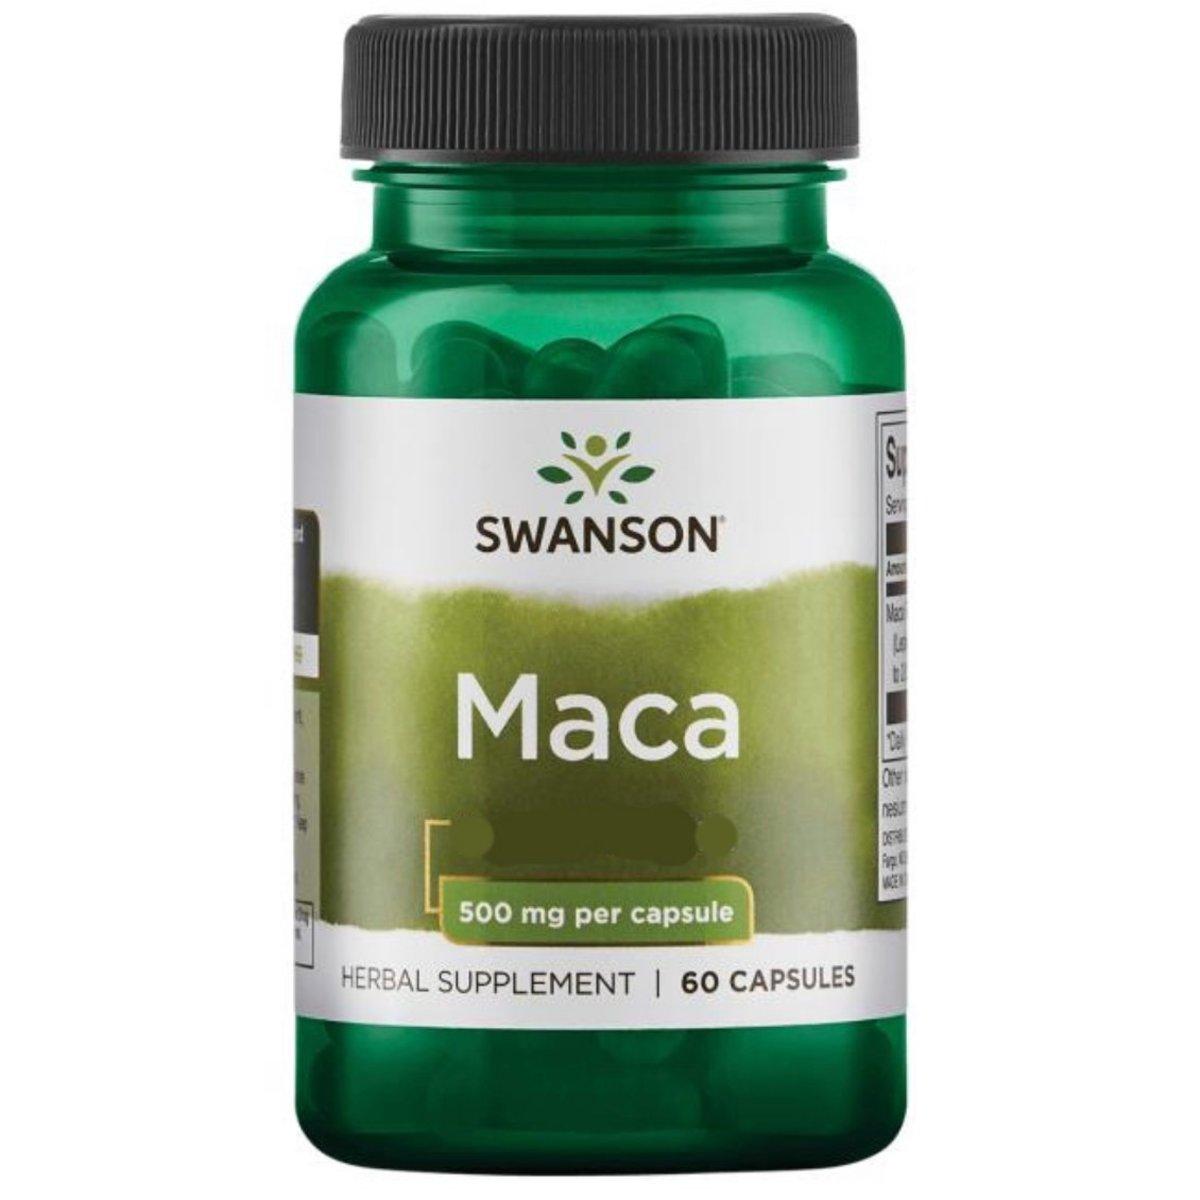 Swanson Passion Maca 500mg 60 capsules (EXP: 09/2021)